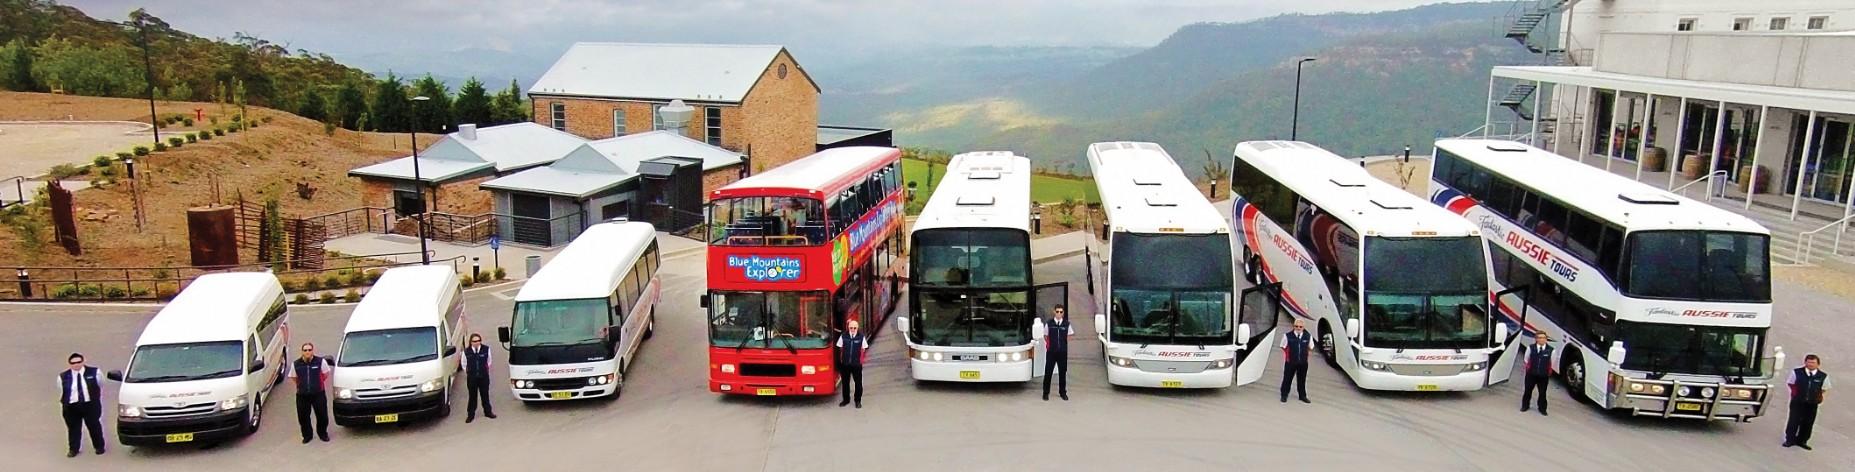 Tours & Transport